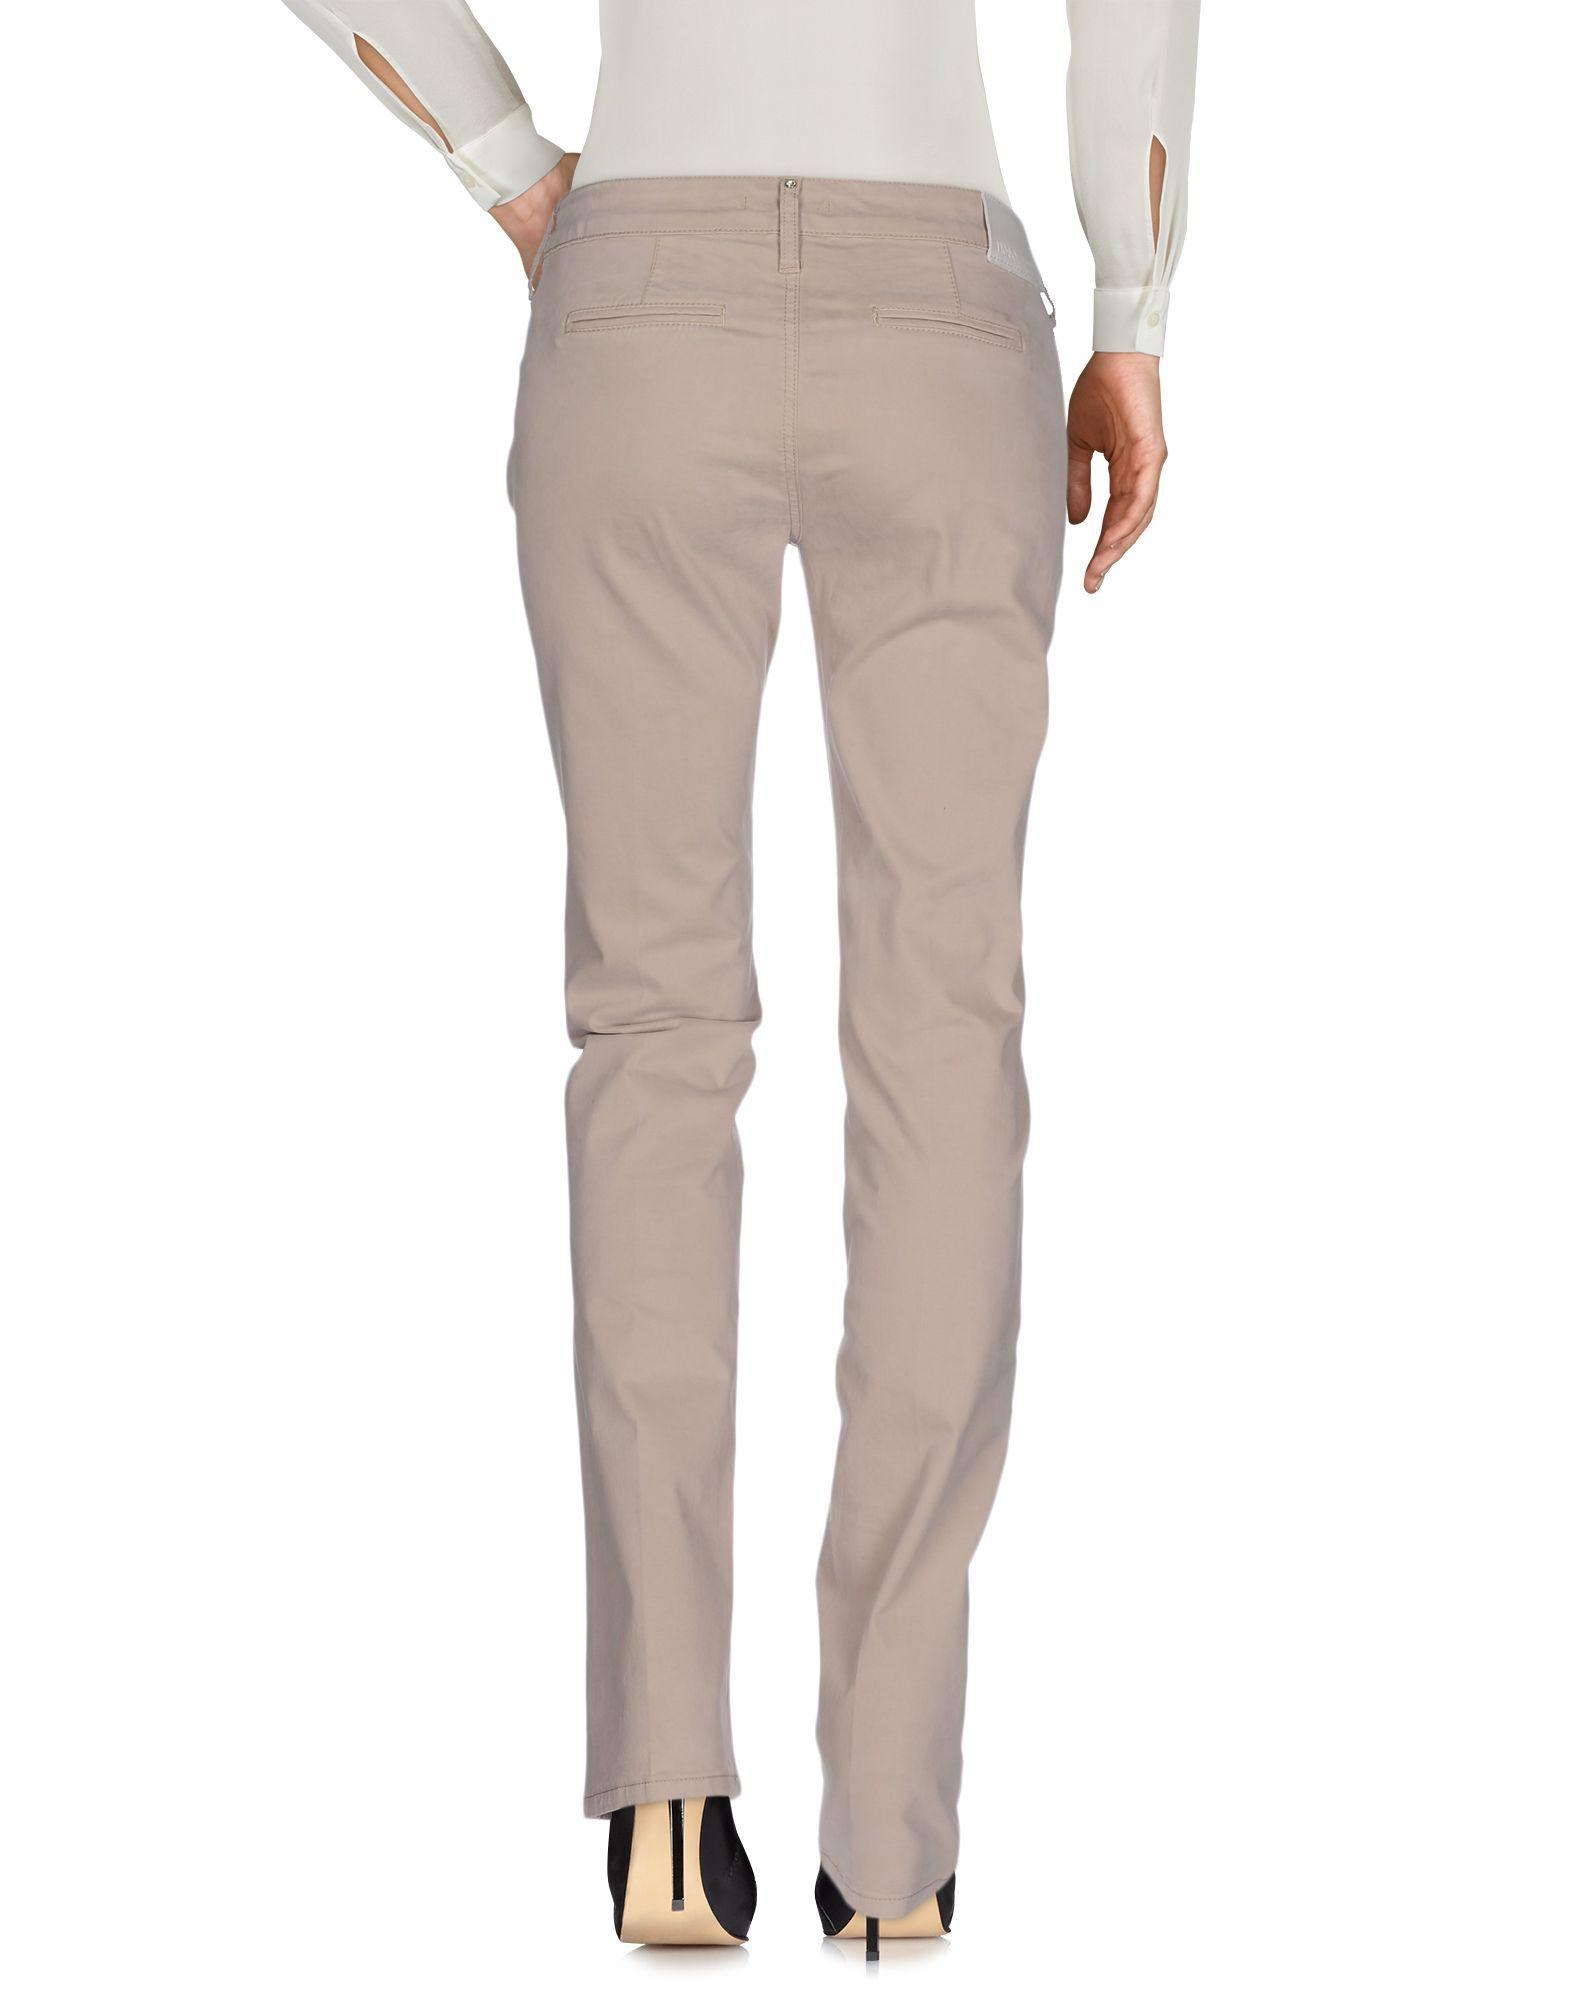 Liu Jo Dove Grey Cotton Trousers